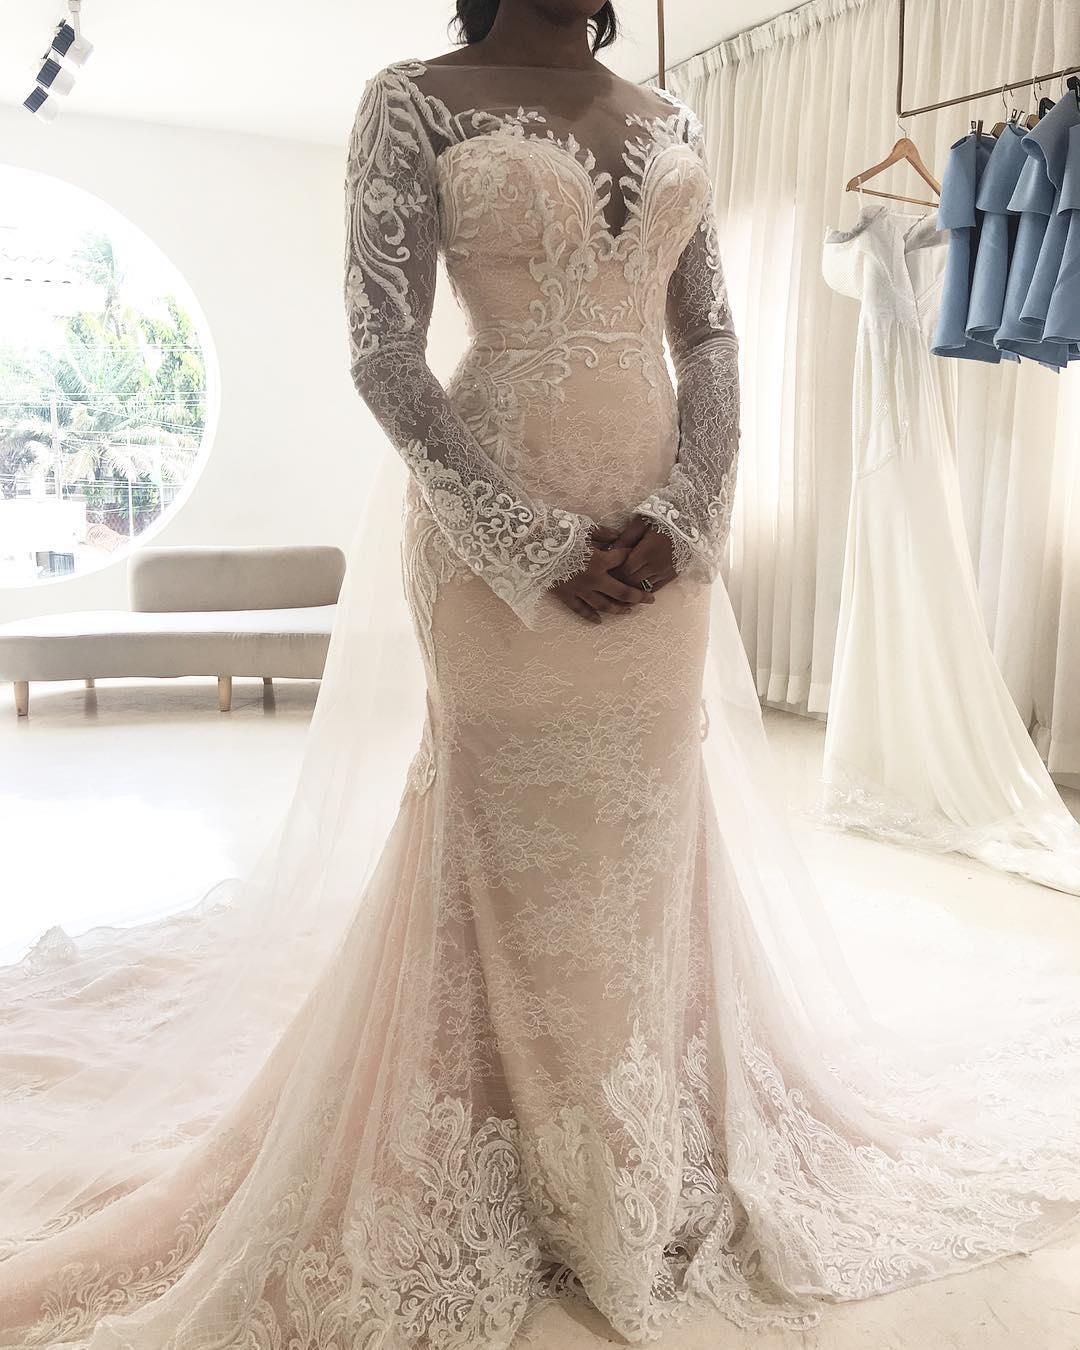 Andrea Iyamah Bridals Fashion and Wedding Dress Designer Toronto